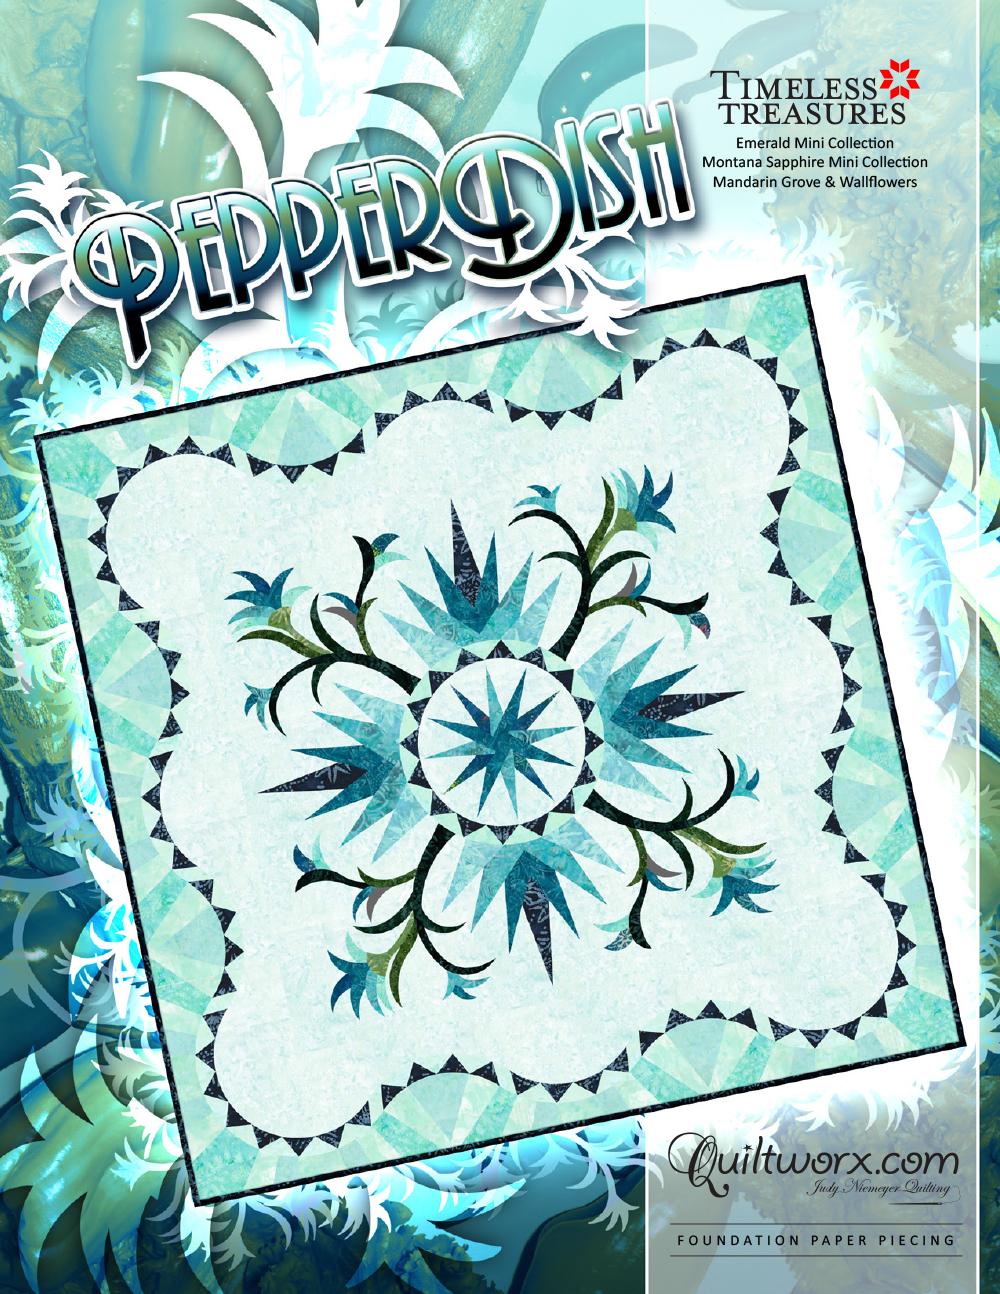 Pepperdish-MG-MT-Sapp-WF-Cover